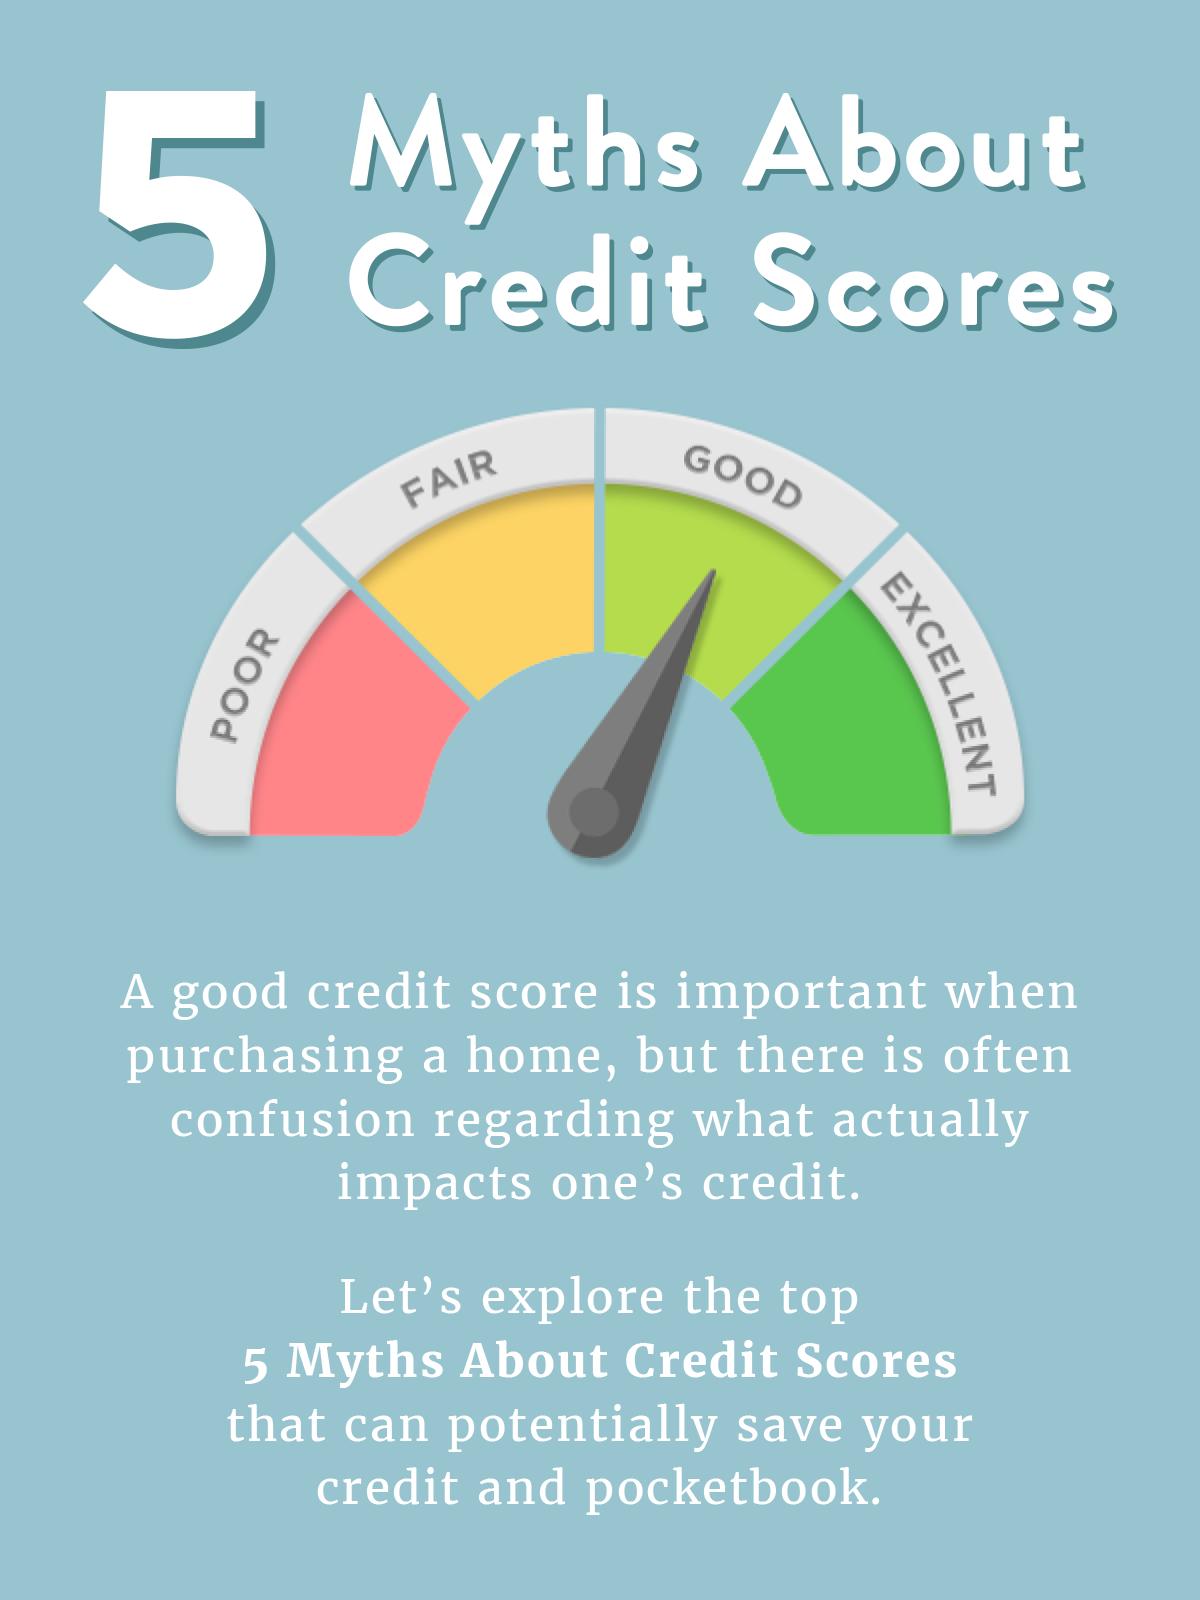 5 Myths about Credit Scores